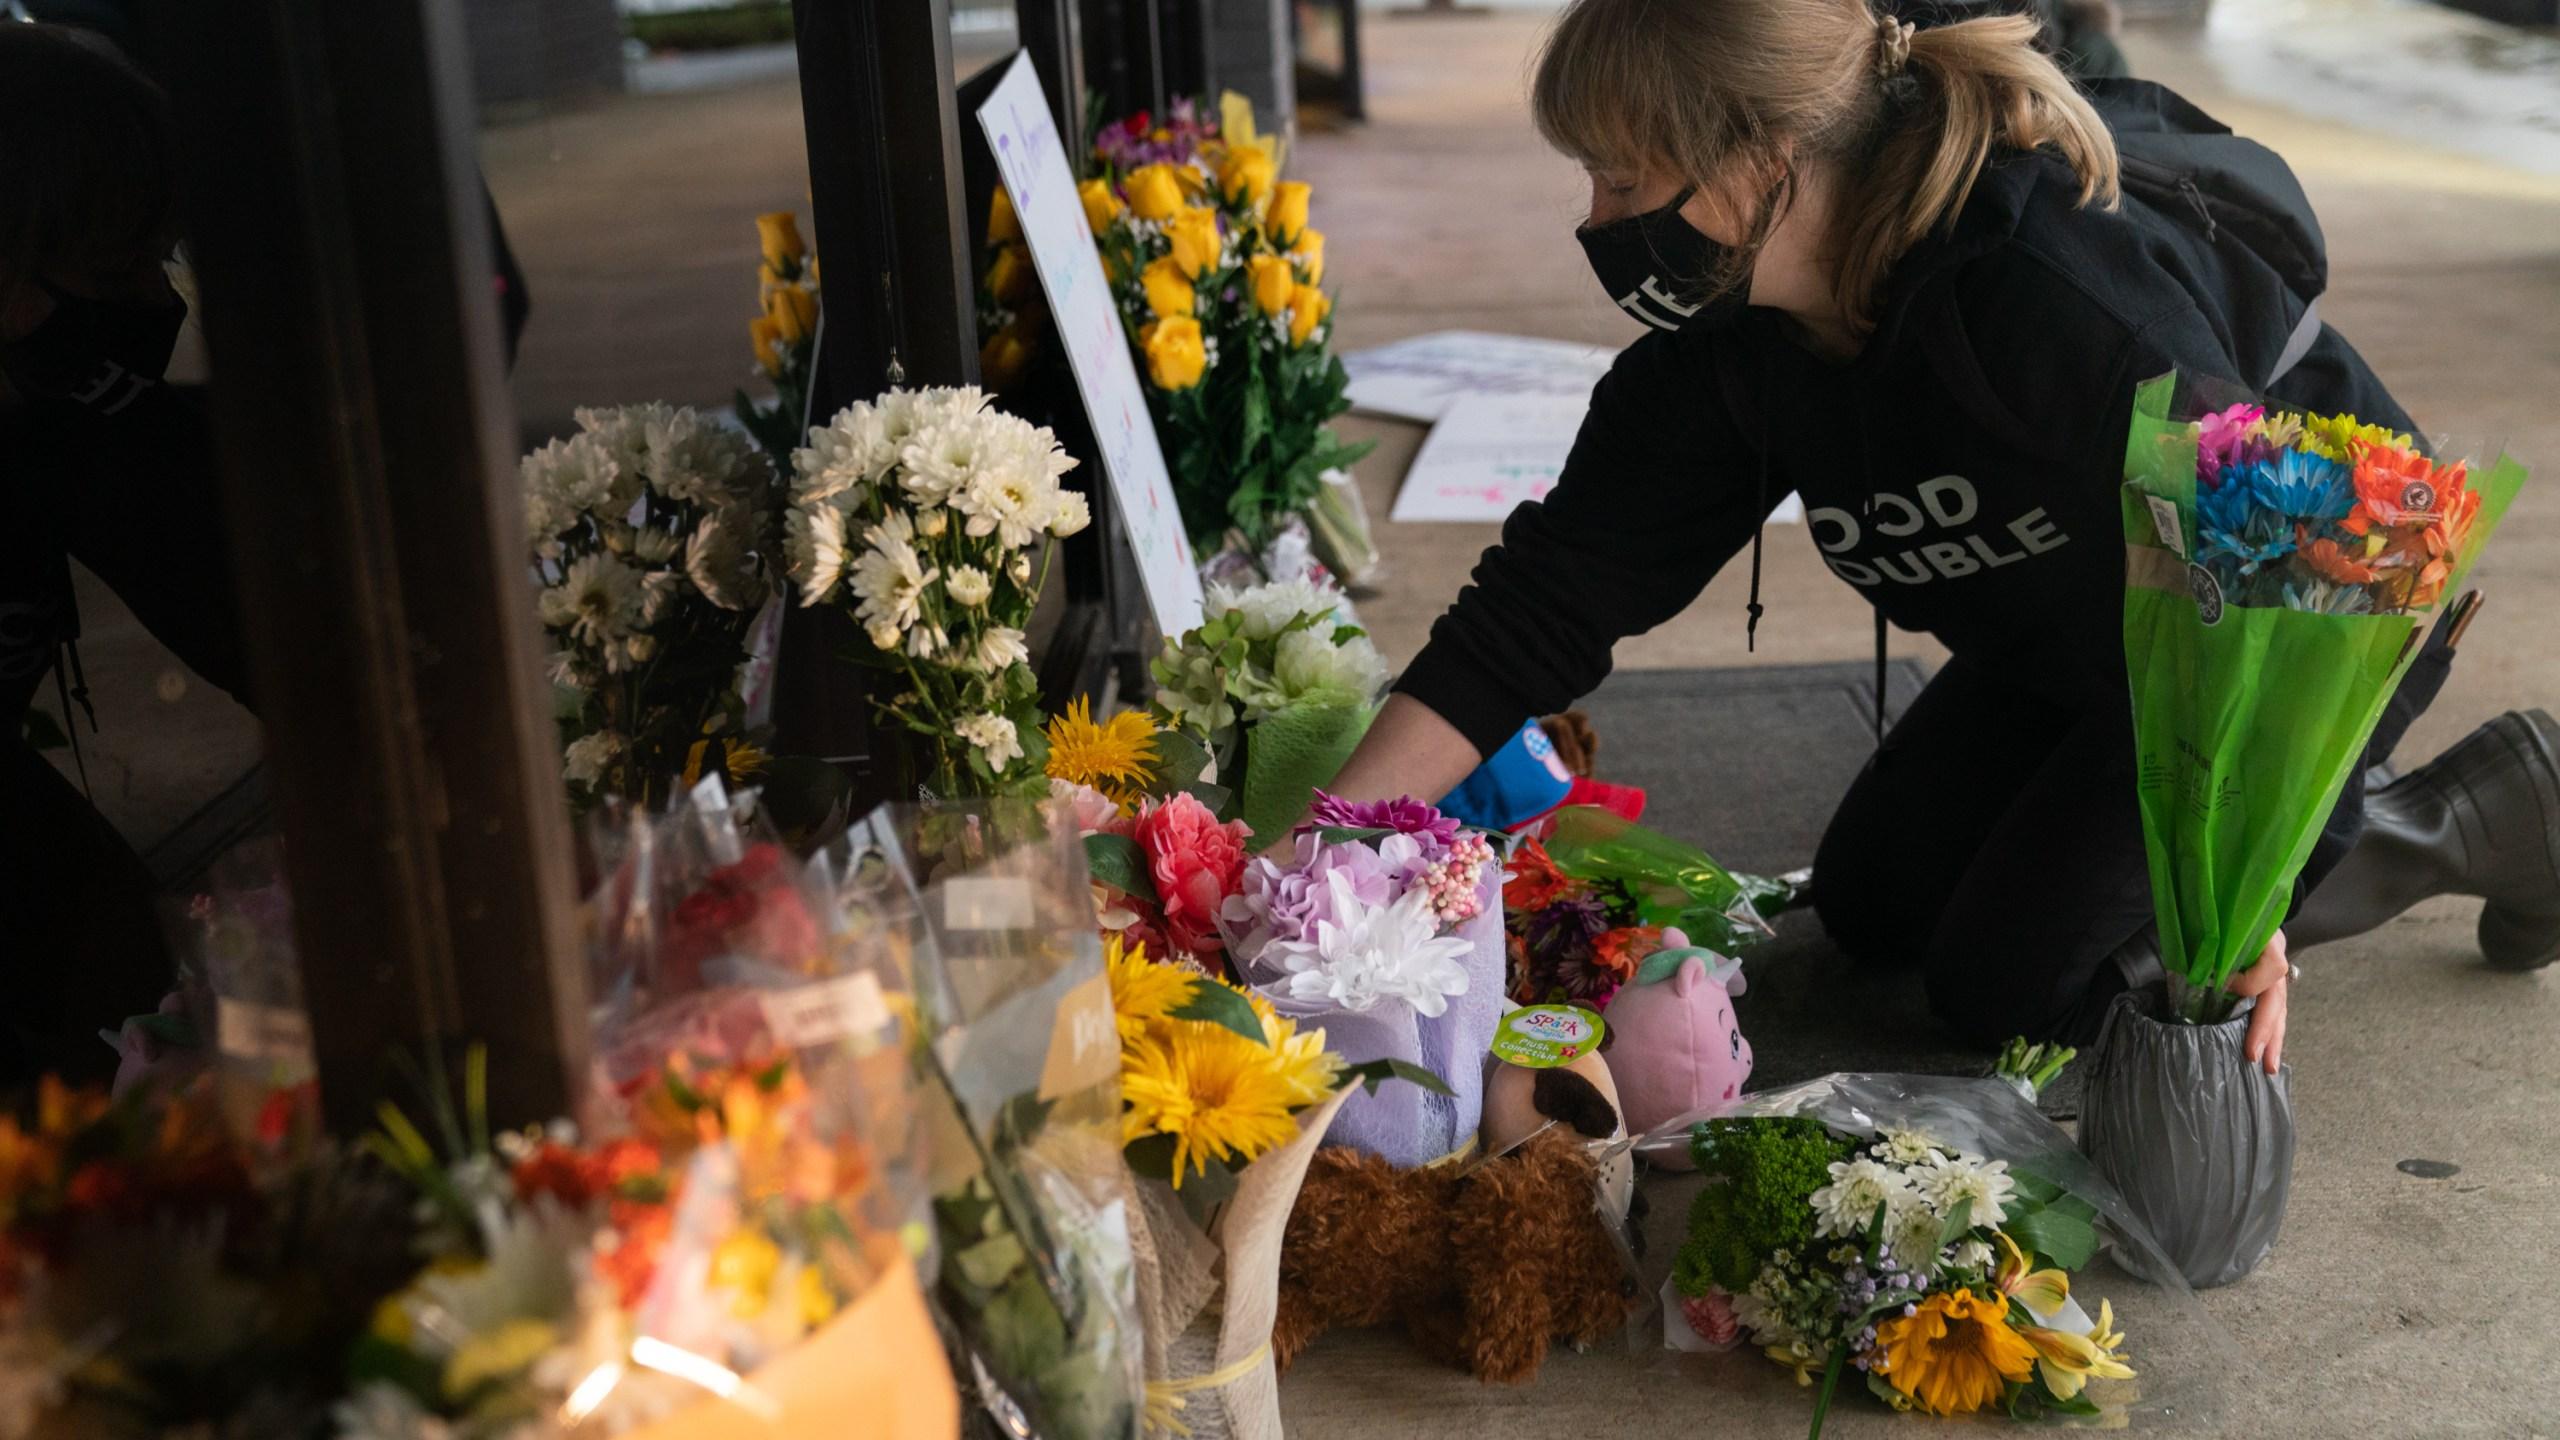 New mom, Army veteran among 8 victims killed in Atlanta-area spa shootings  | KTLA